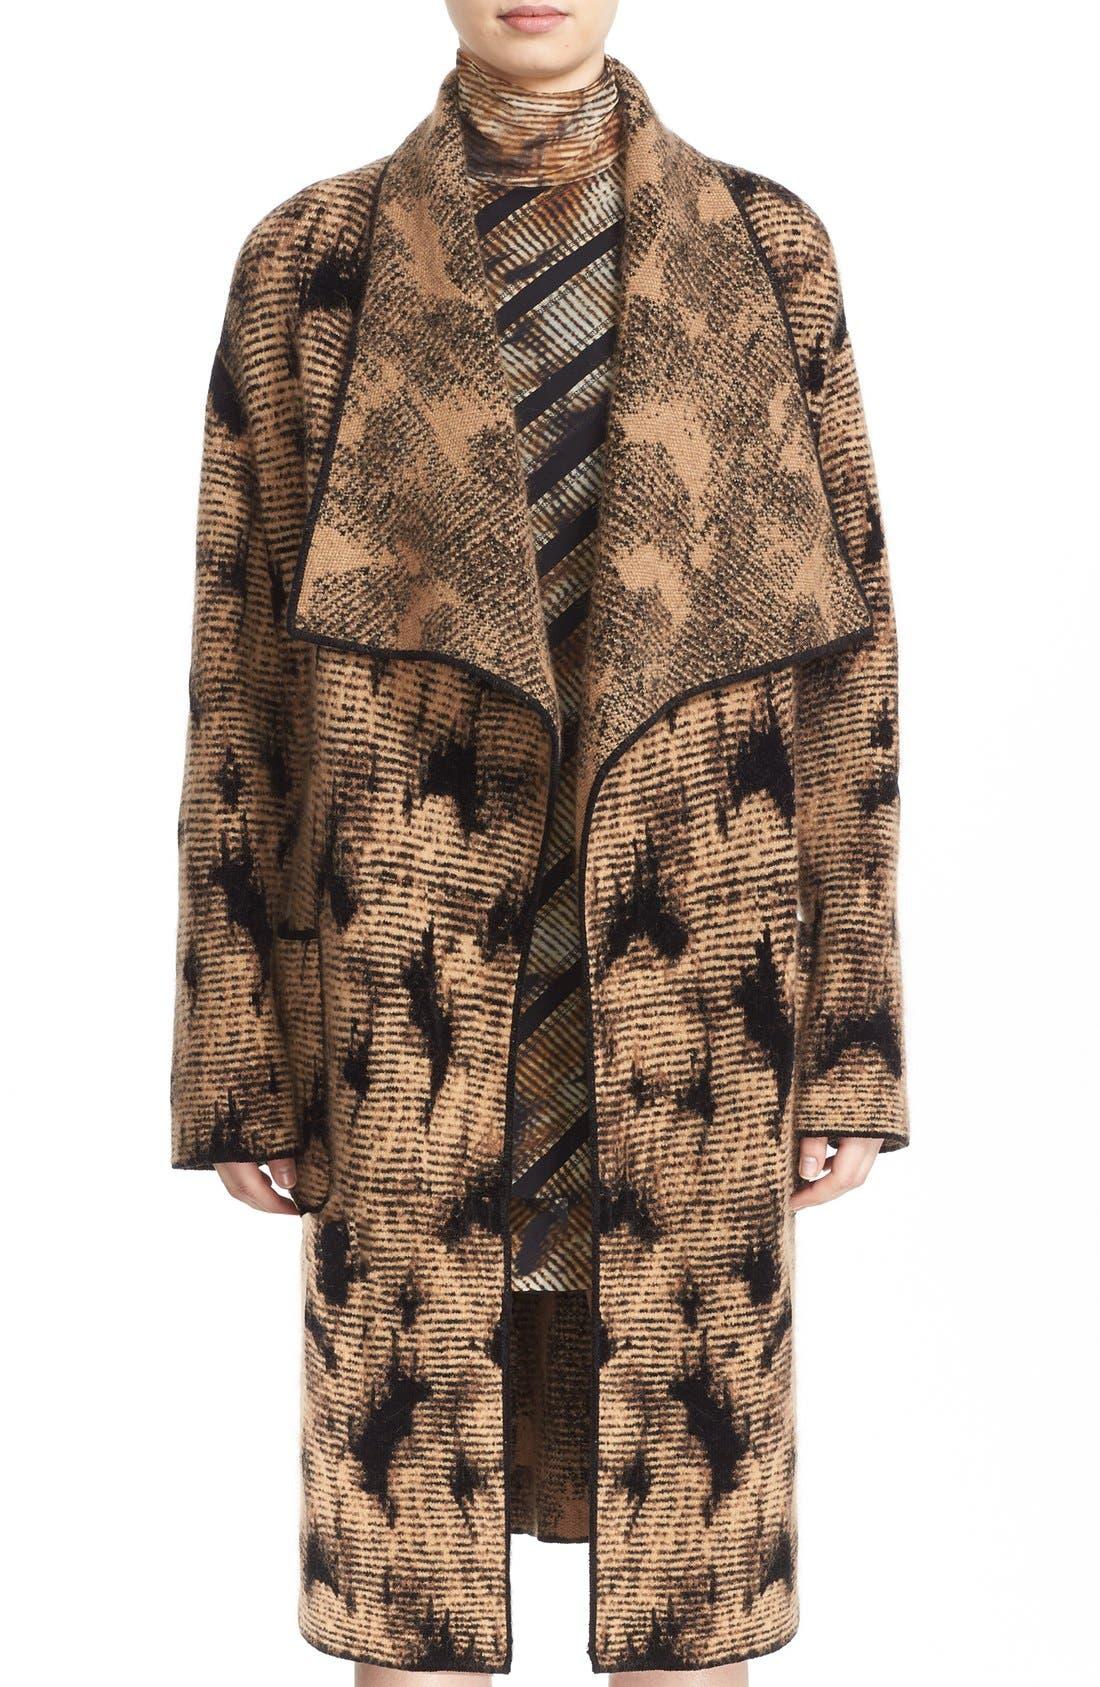 Alternate Image 1 Selected - Fuzzi Jacquard Knit Coat